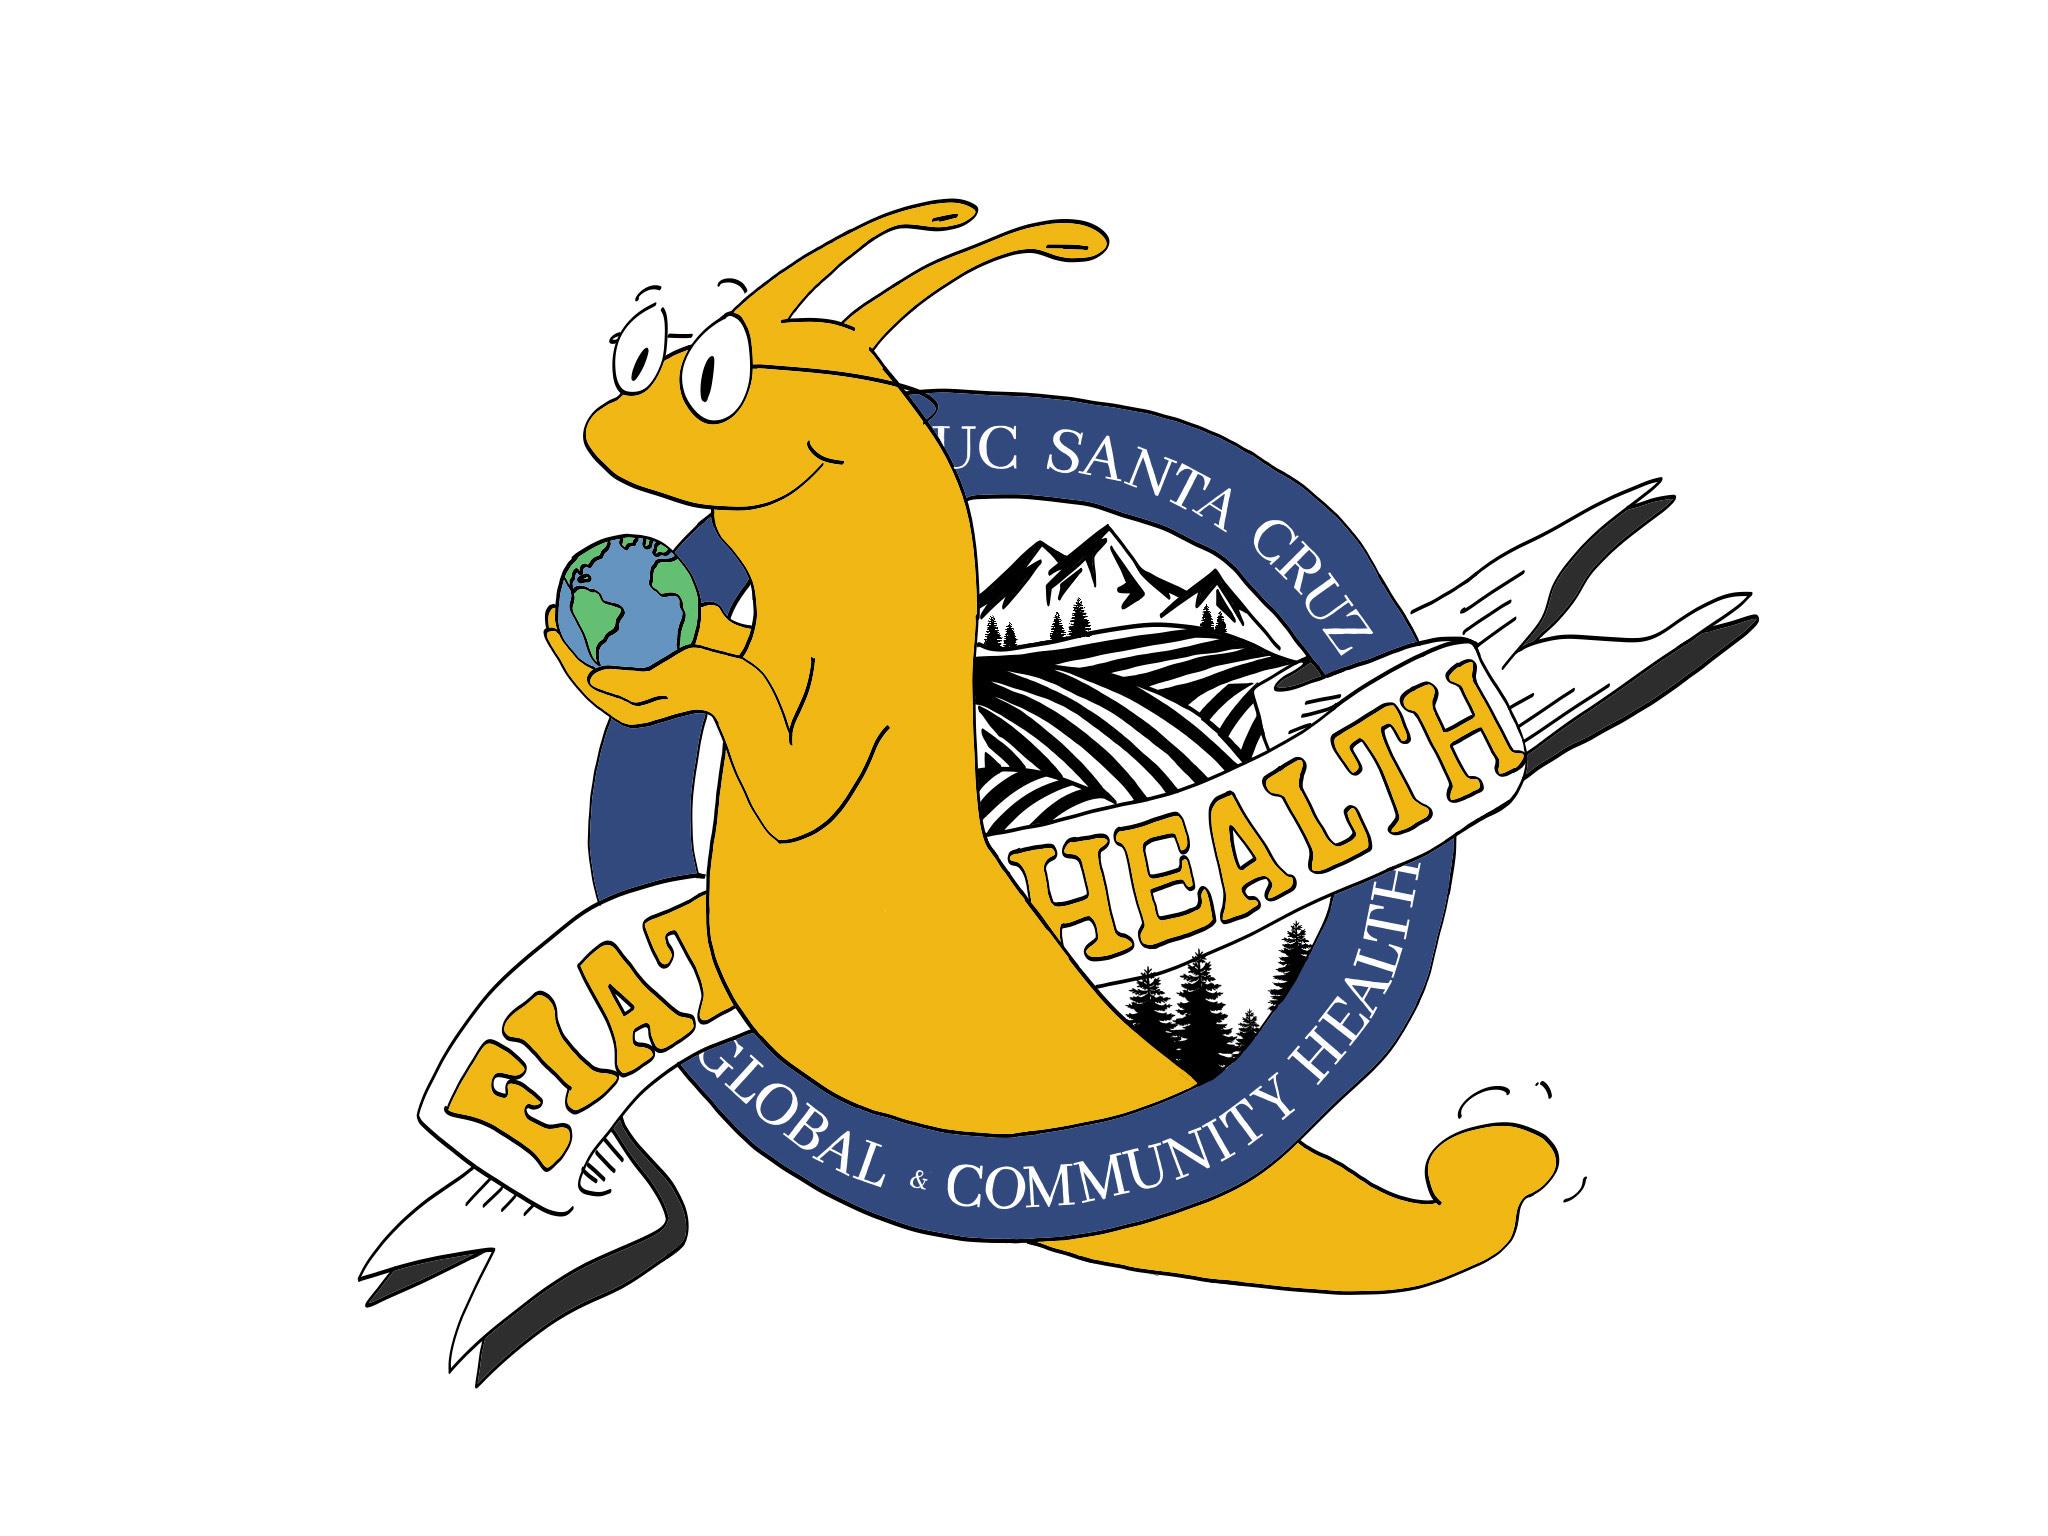 Slug logo for Global and Community Health